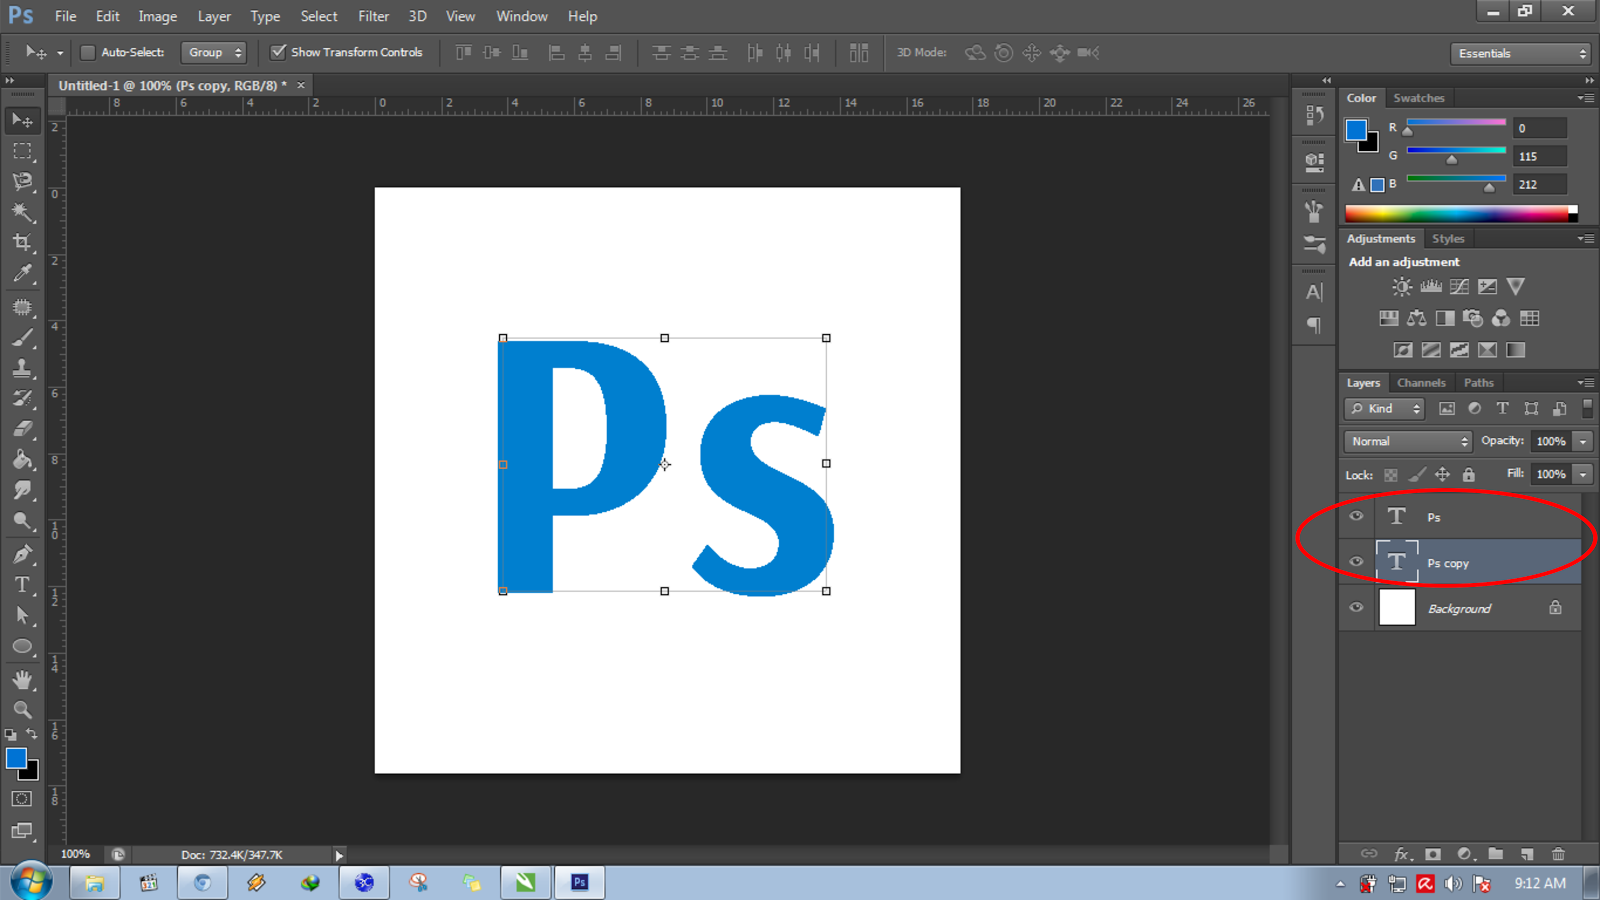 cara membuat clipart di photoshop - photo #50